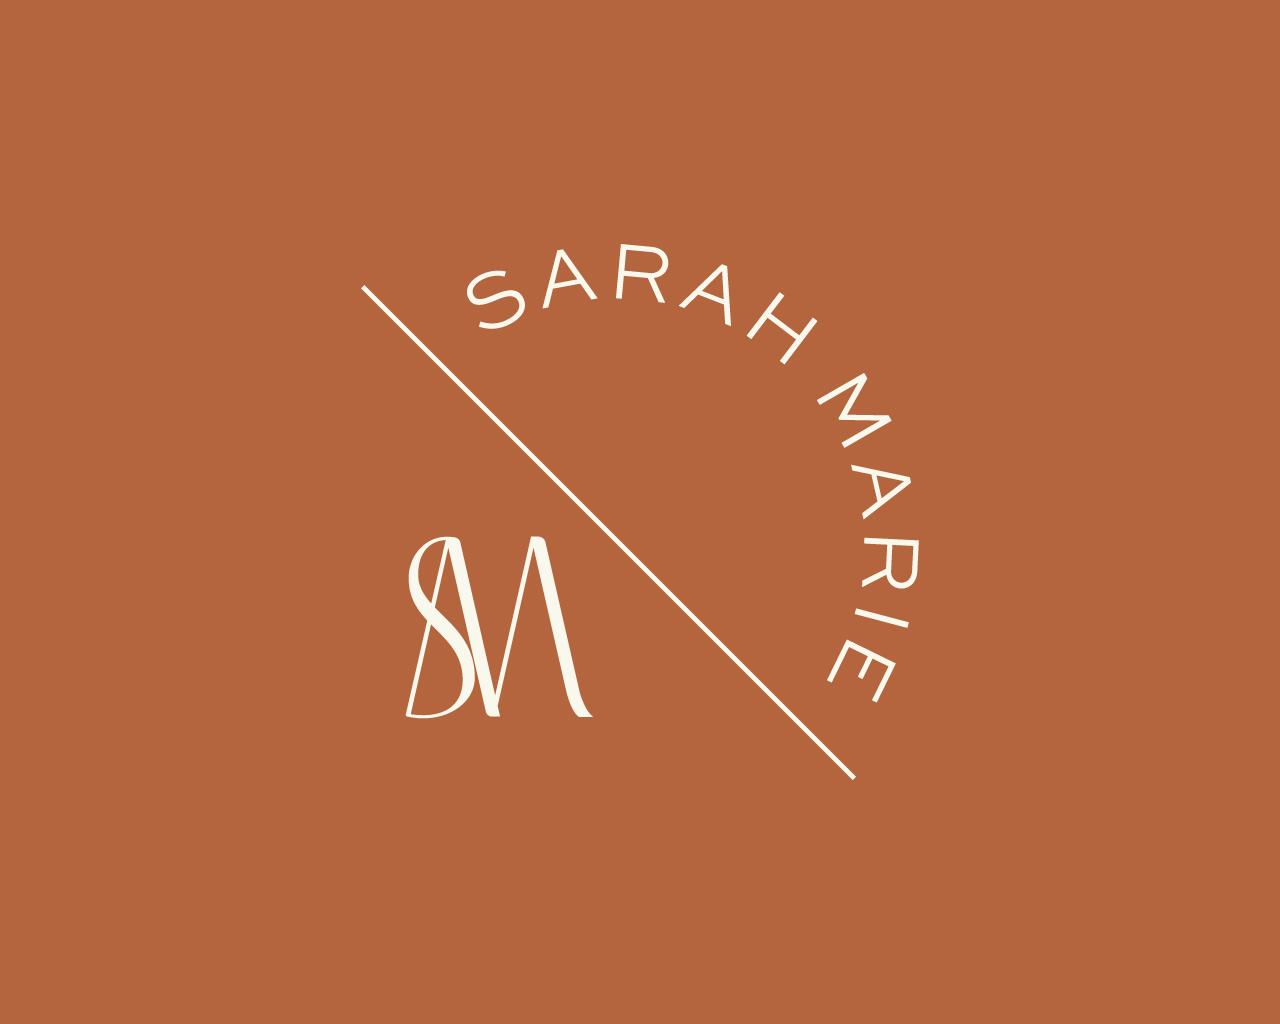 Sarah Marie Custom Brand Pattern | Witt and Company